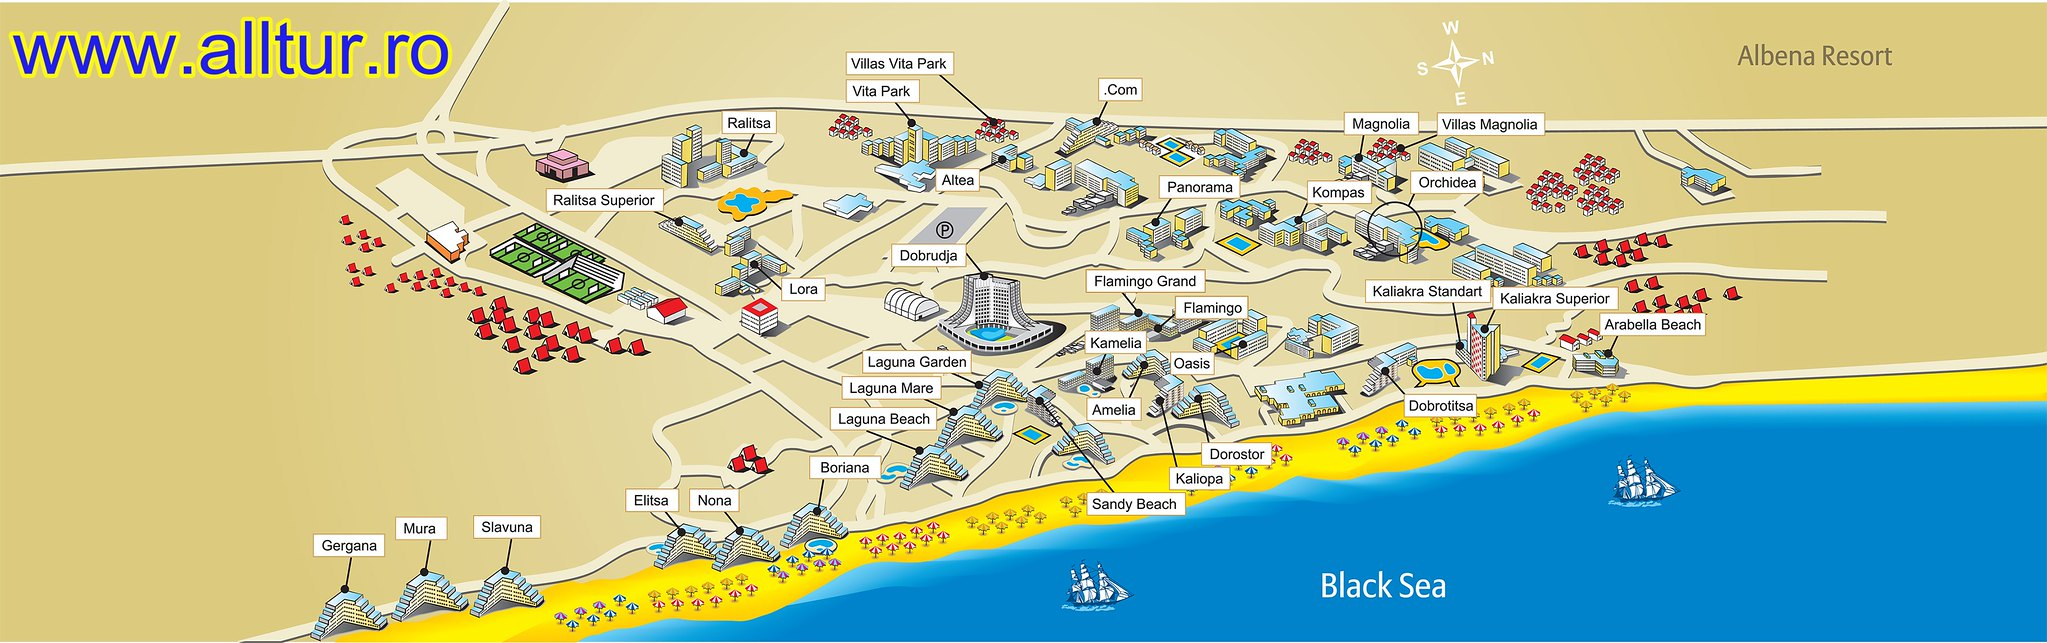 Harta Albena